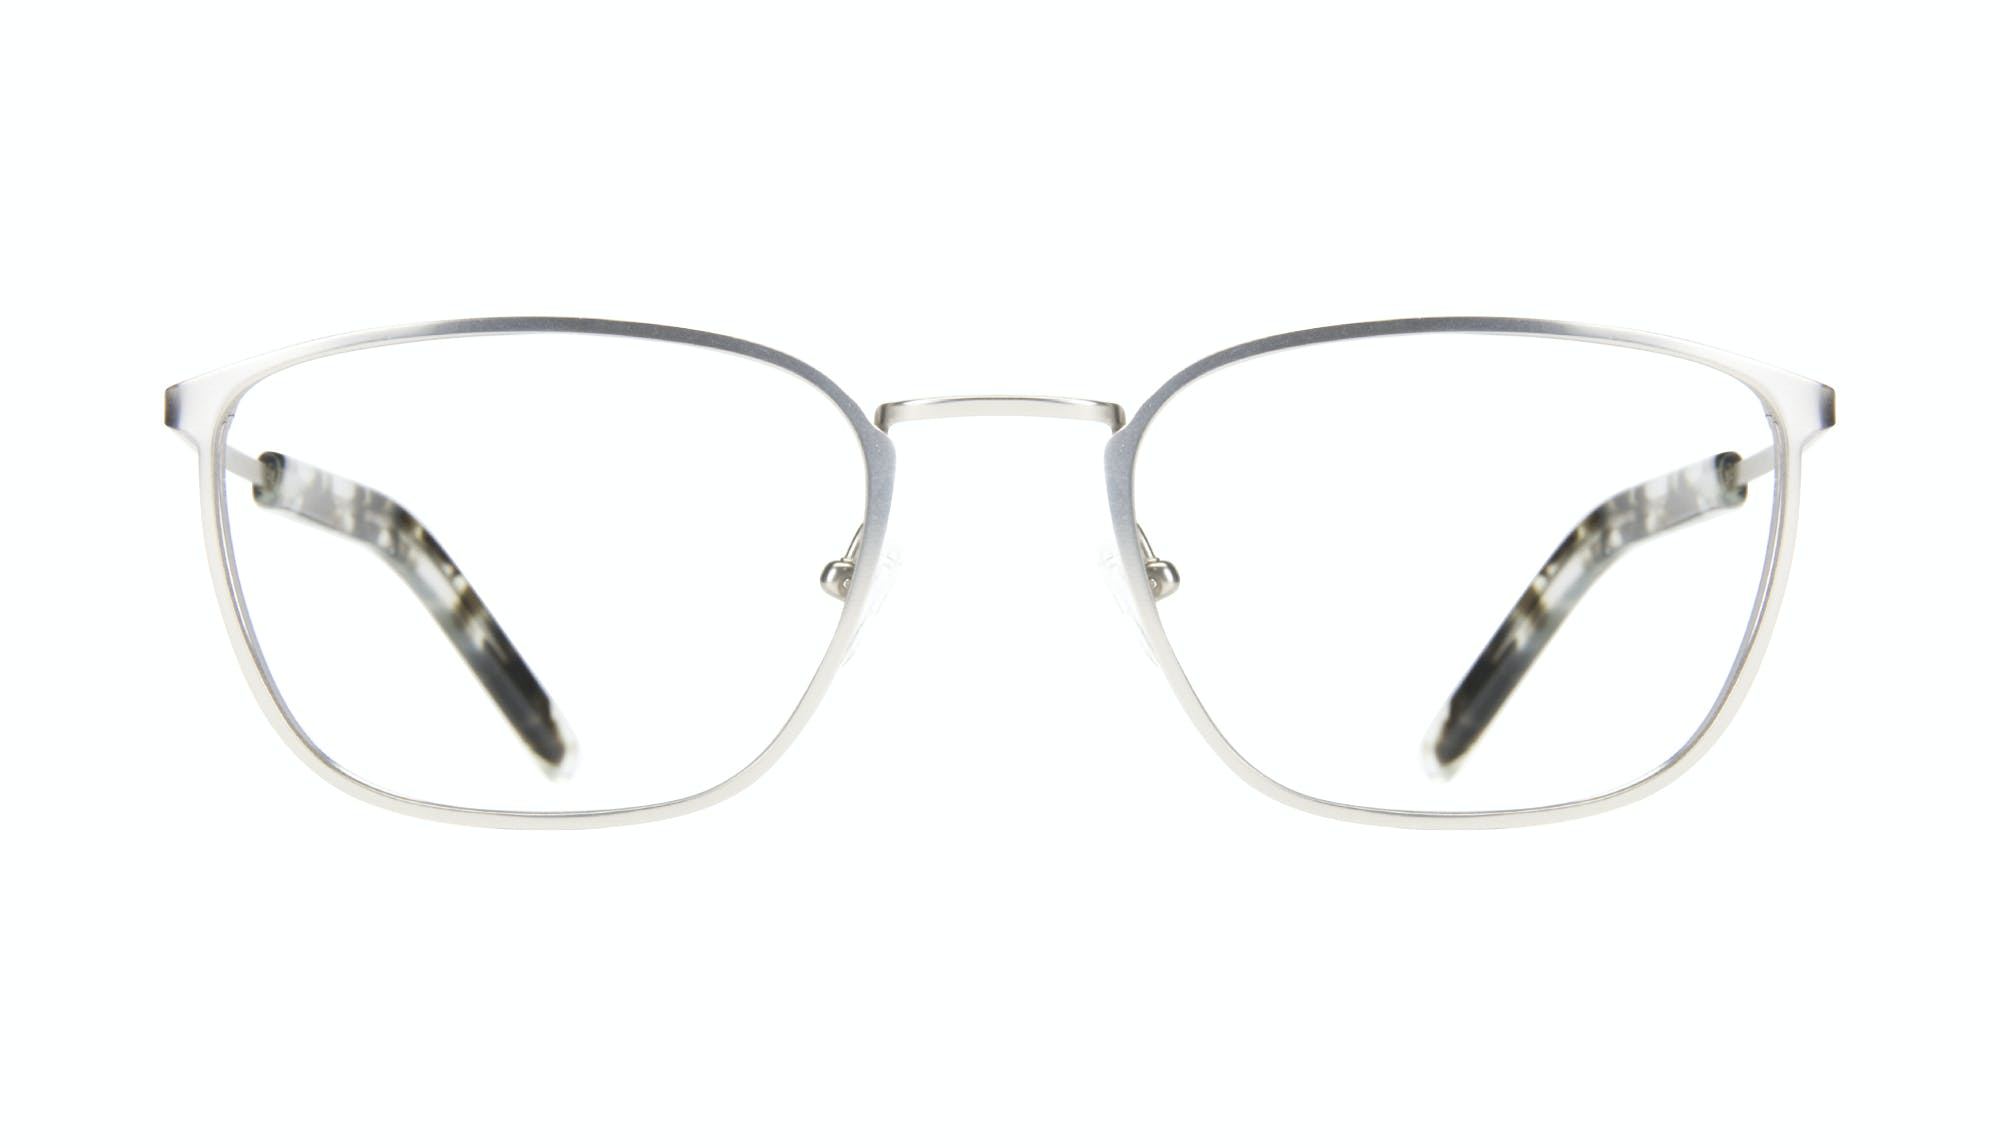 Affordable Fashion Glasses Rectangle Eyeglasses Men Edge Silver Front